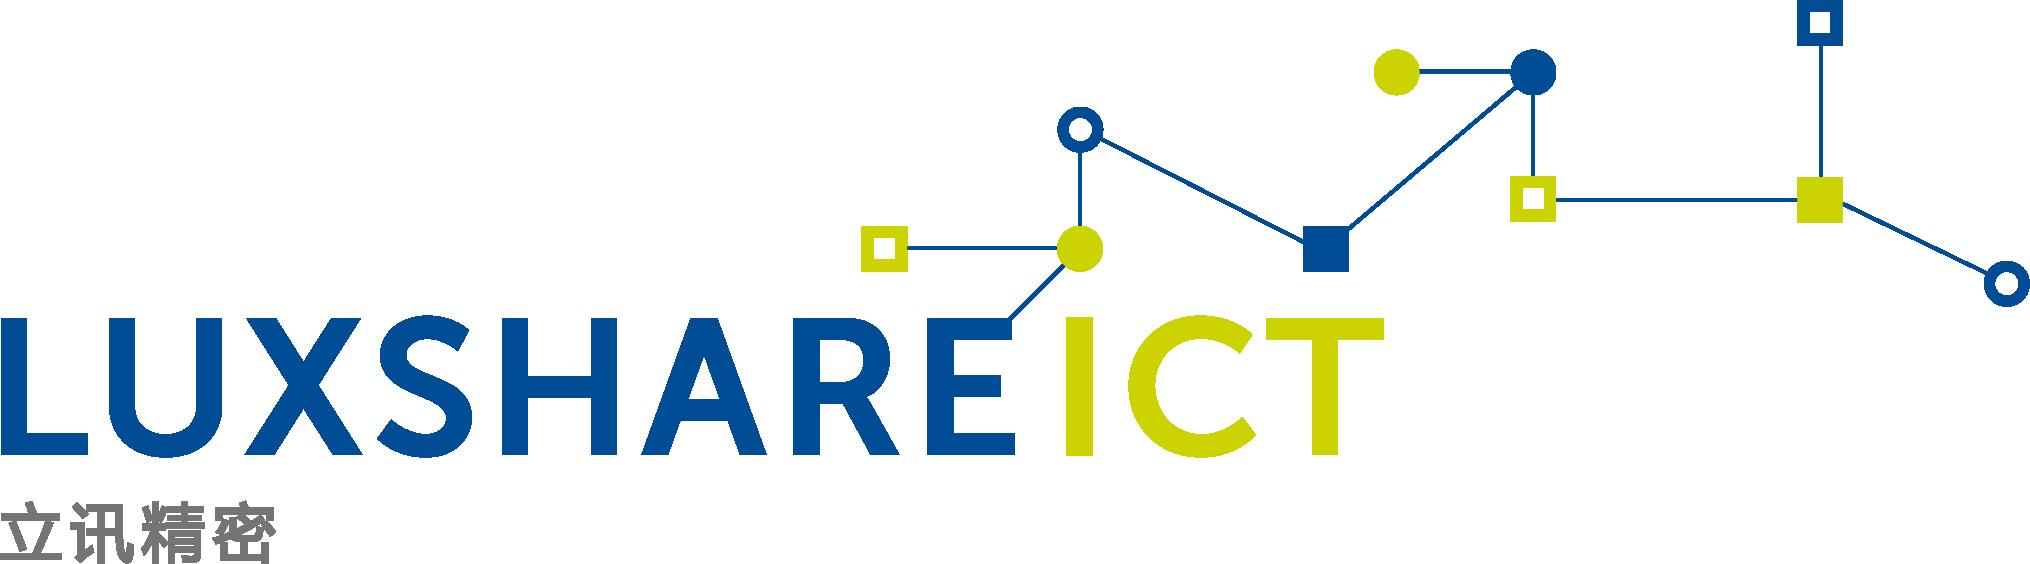 Luxshare-ICT, INC